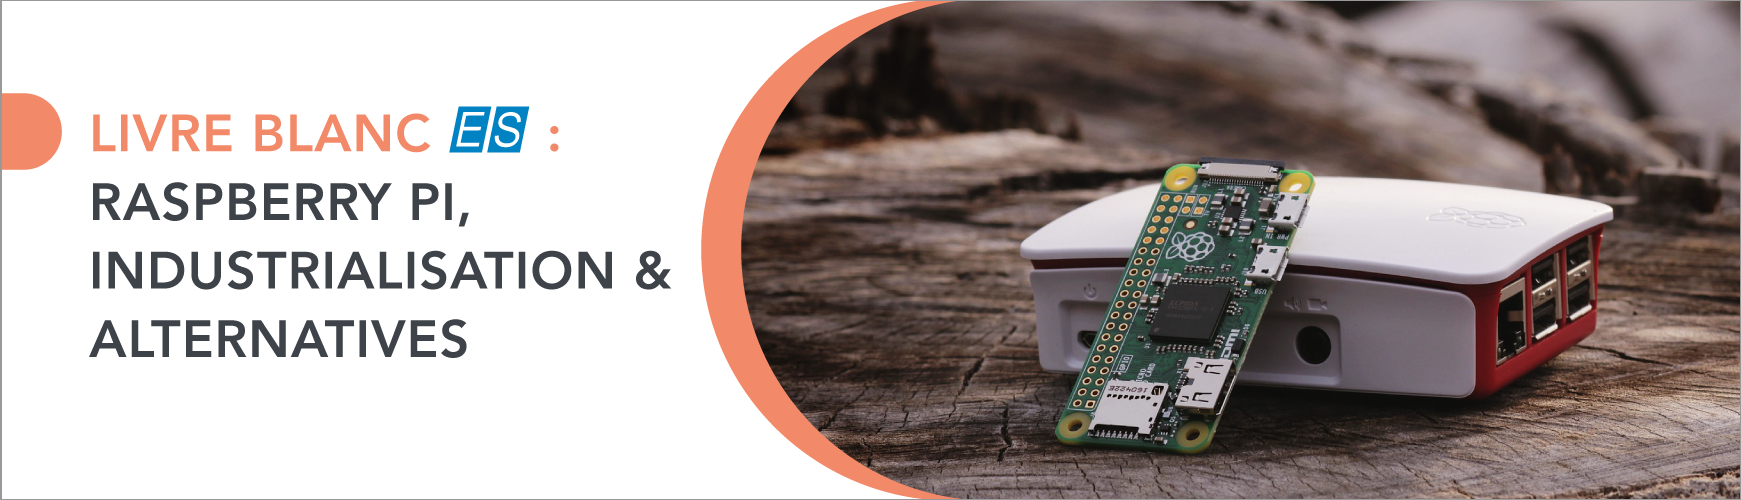 Livre Blanc : Raspberry Pi, industrialisation et alternatives